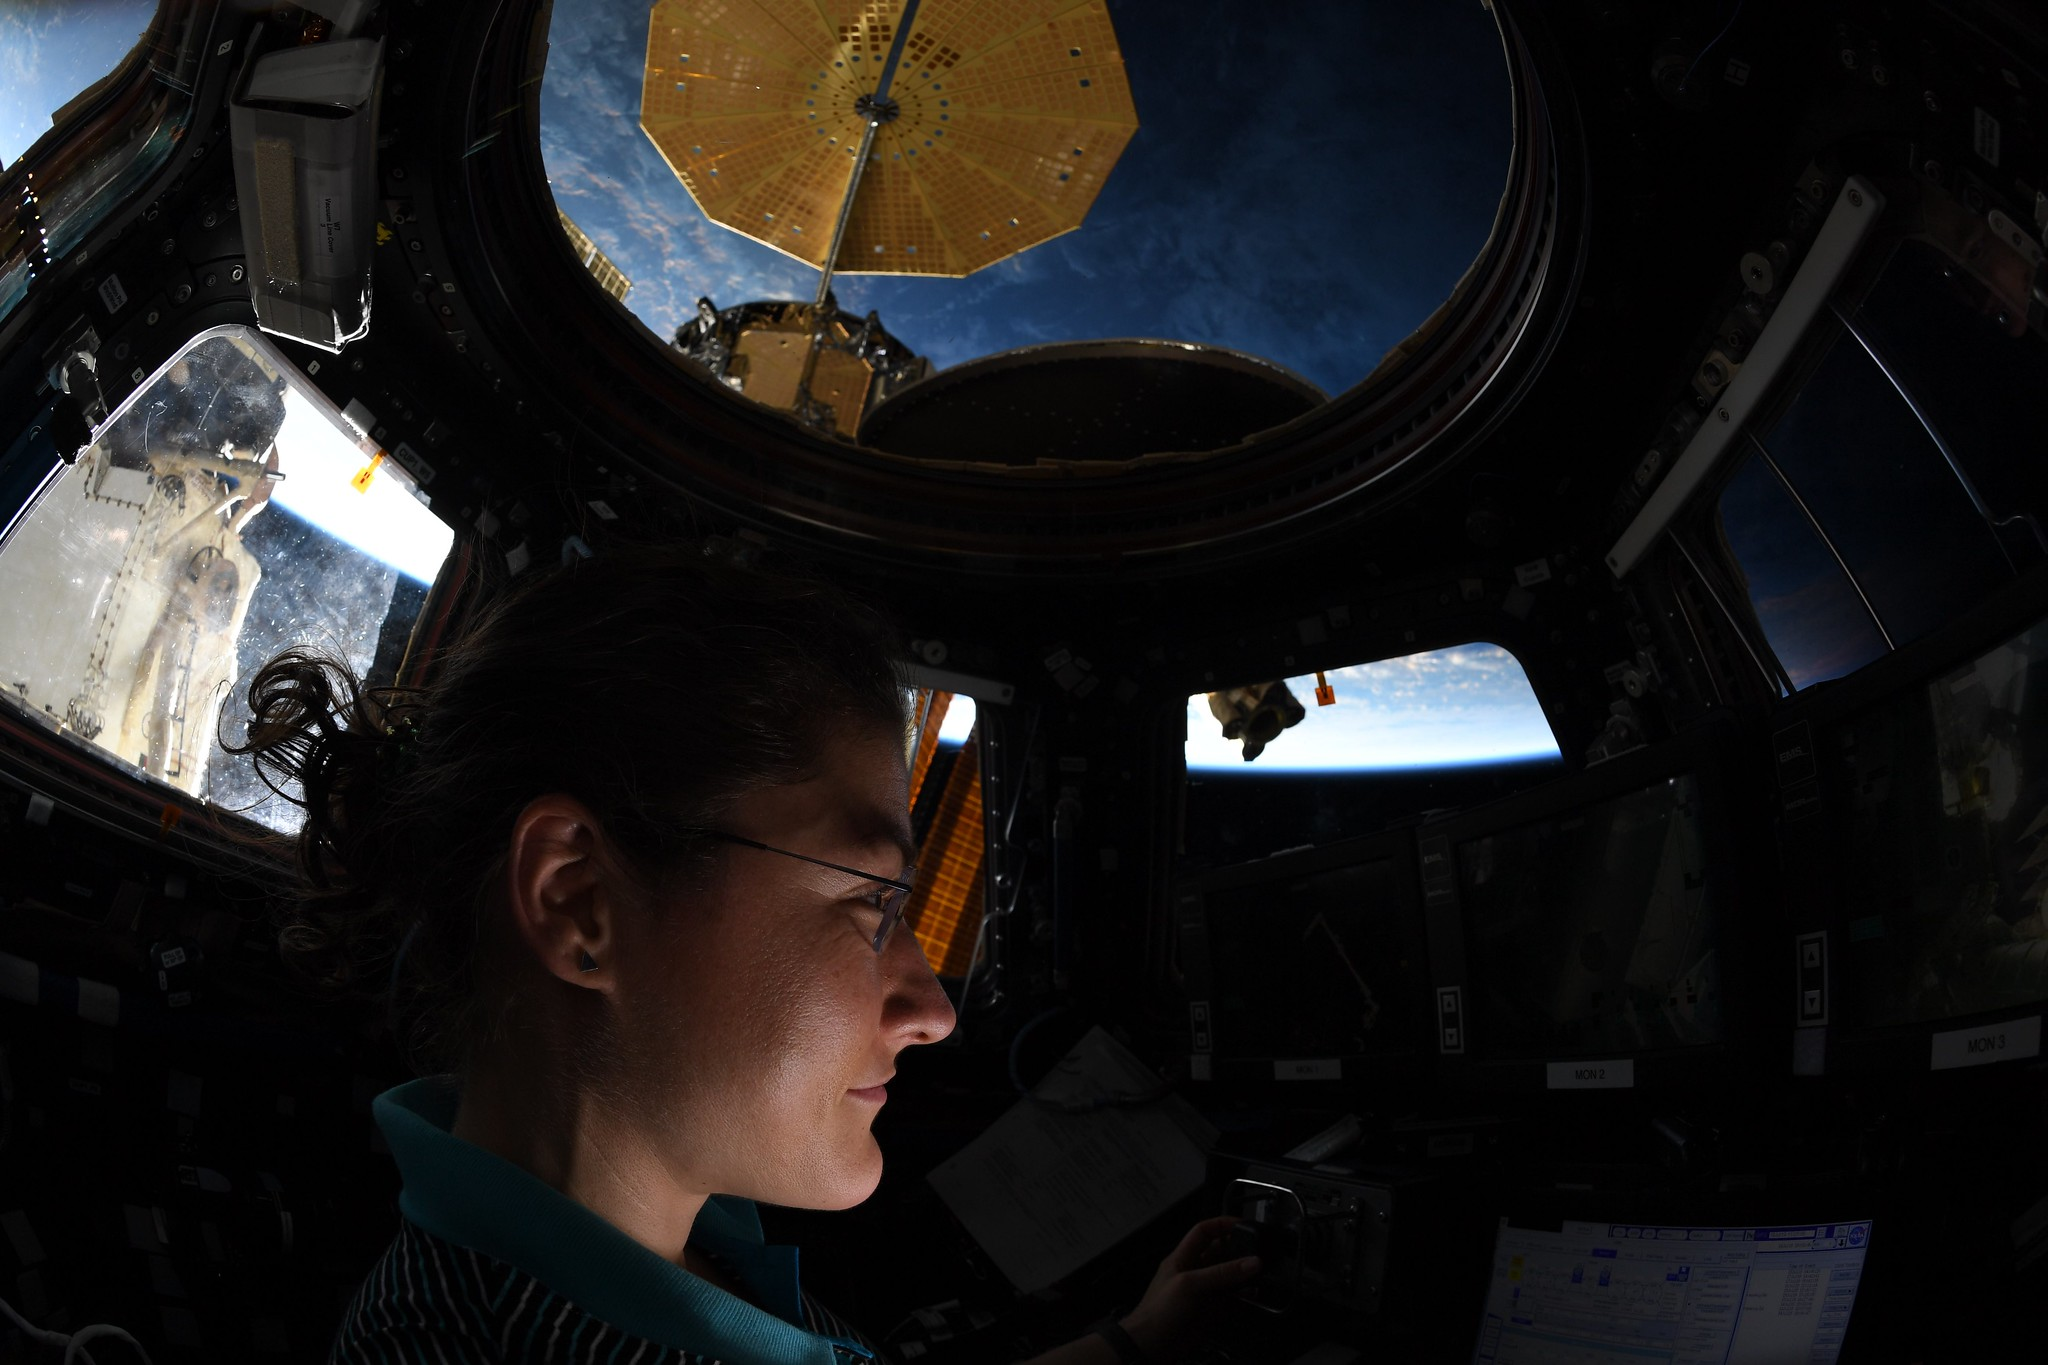 Astronaut Christina Koch on the International Space Station